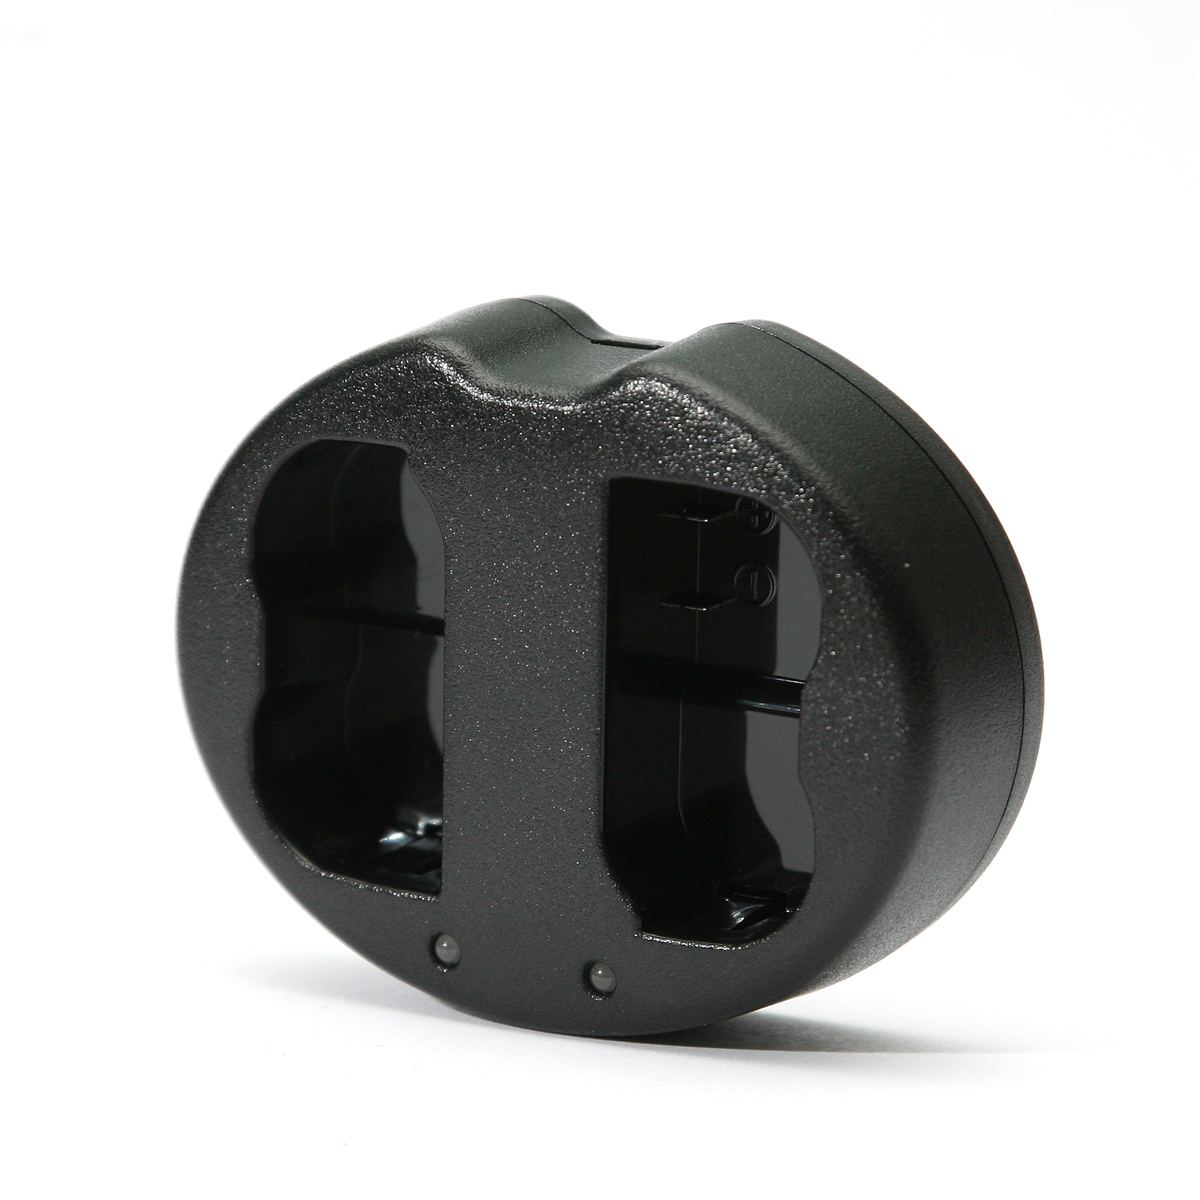 Купить Зарядное устройство PowerPlant Dual Canon LP-E8 для двух аккумуляторов